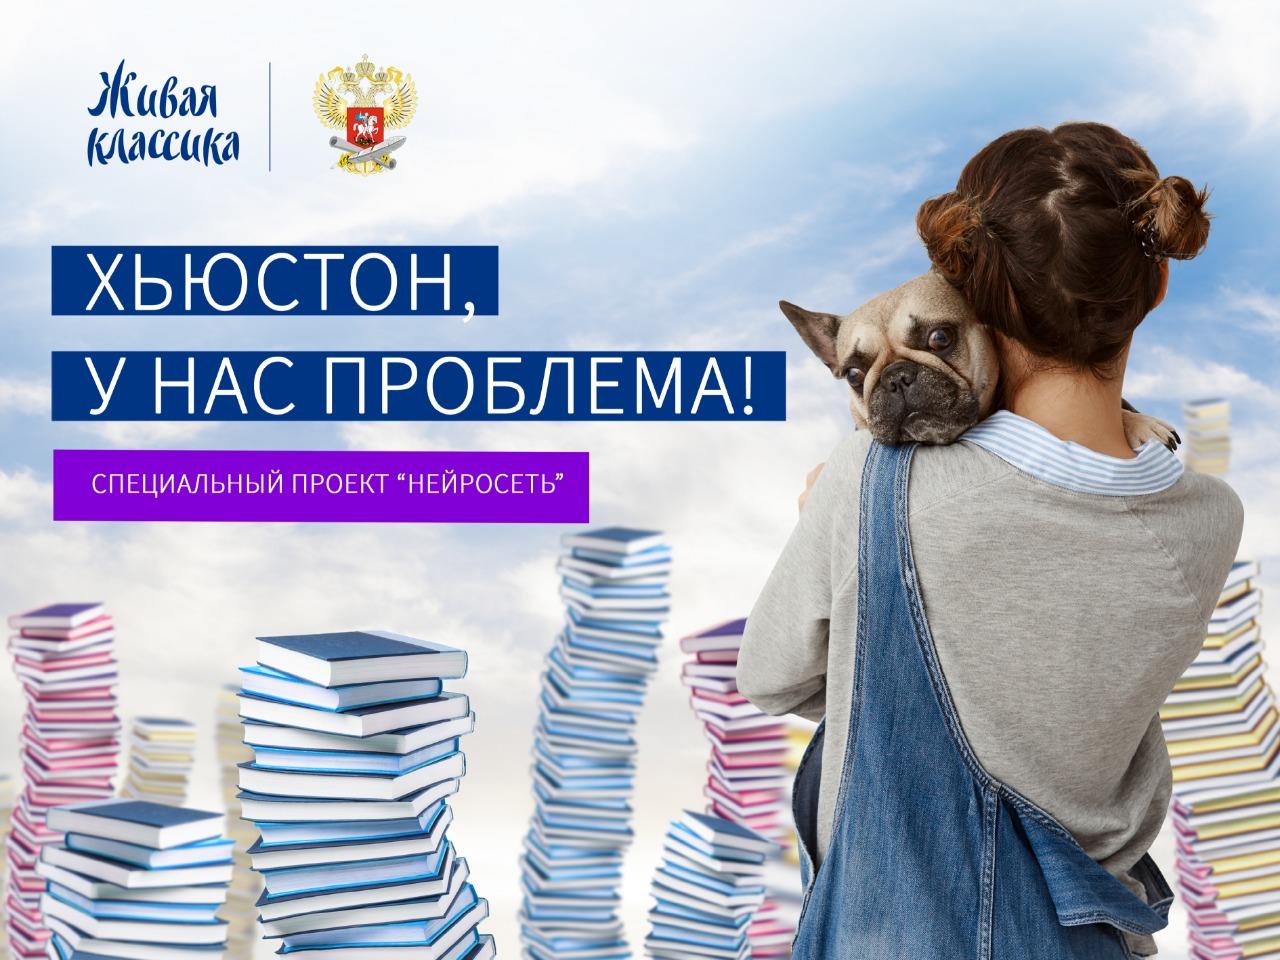 Подросткам Петербурга подберут книгу по темпераменту_5fcf145edb306.jpeg